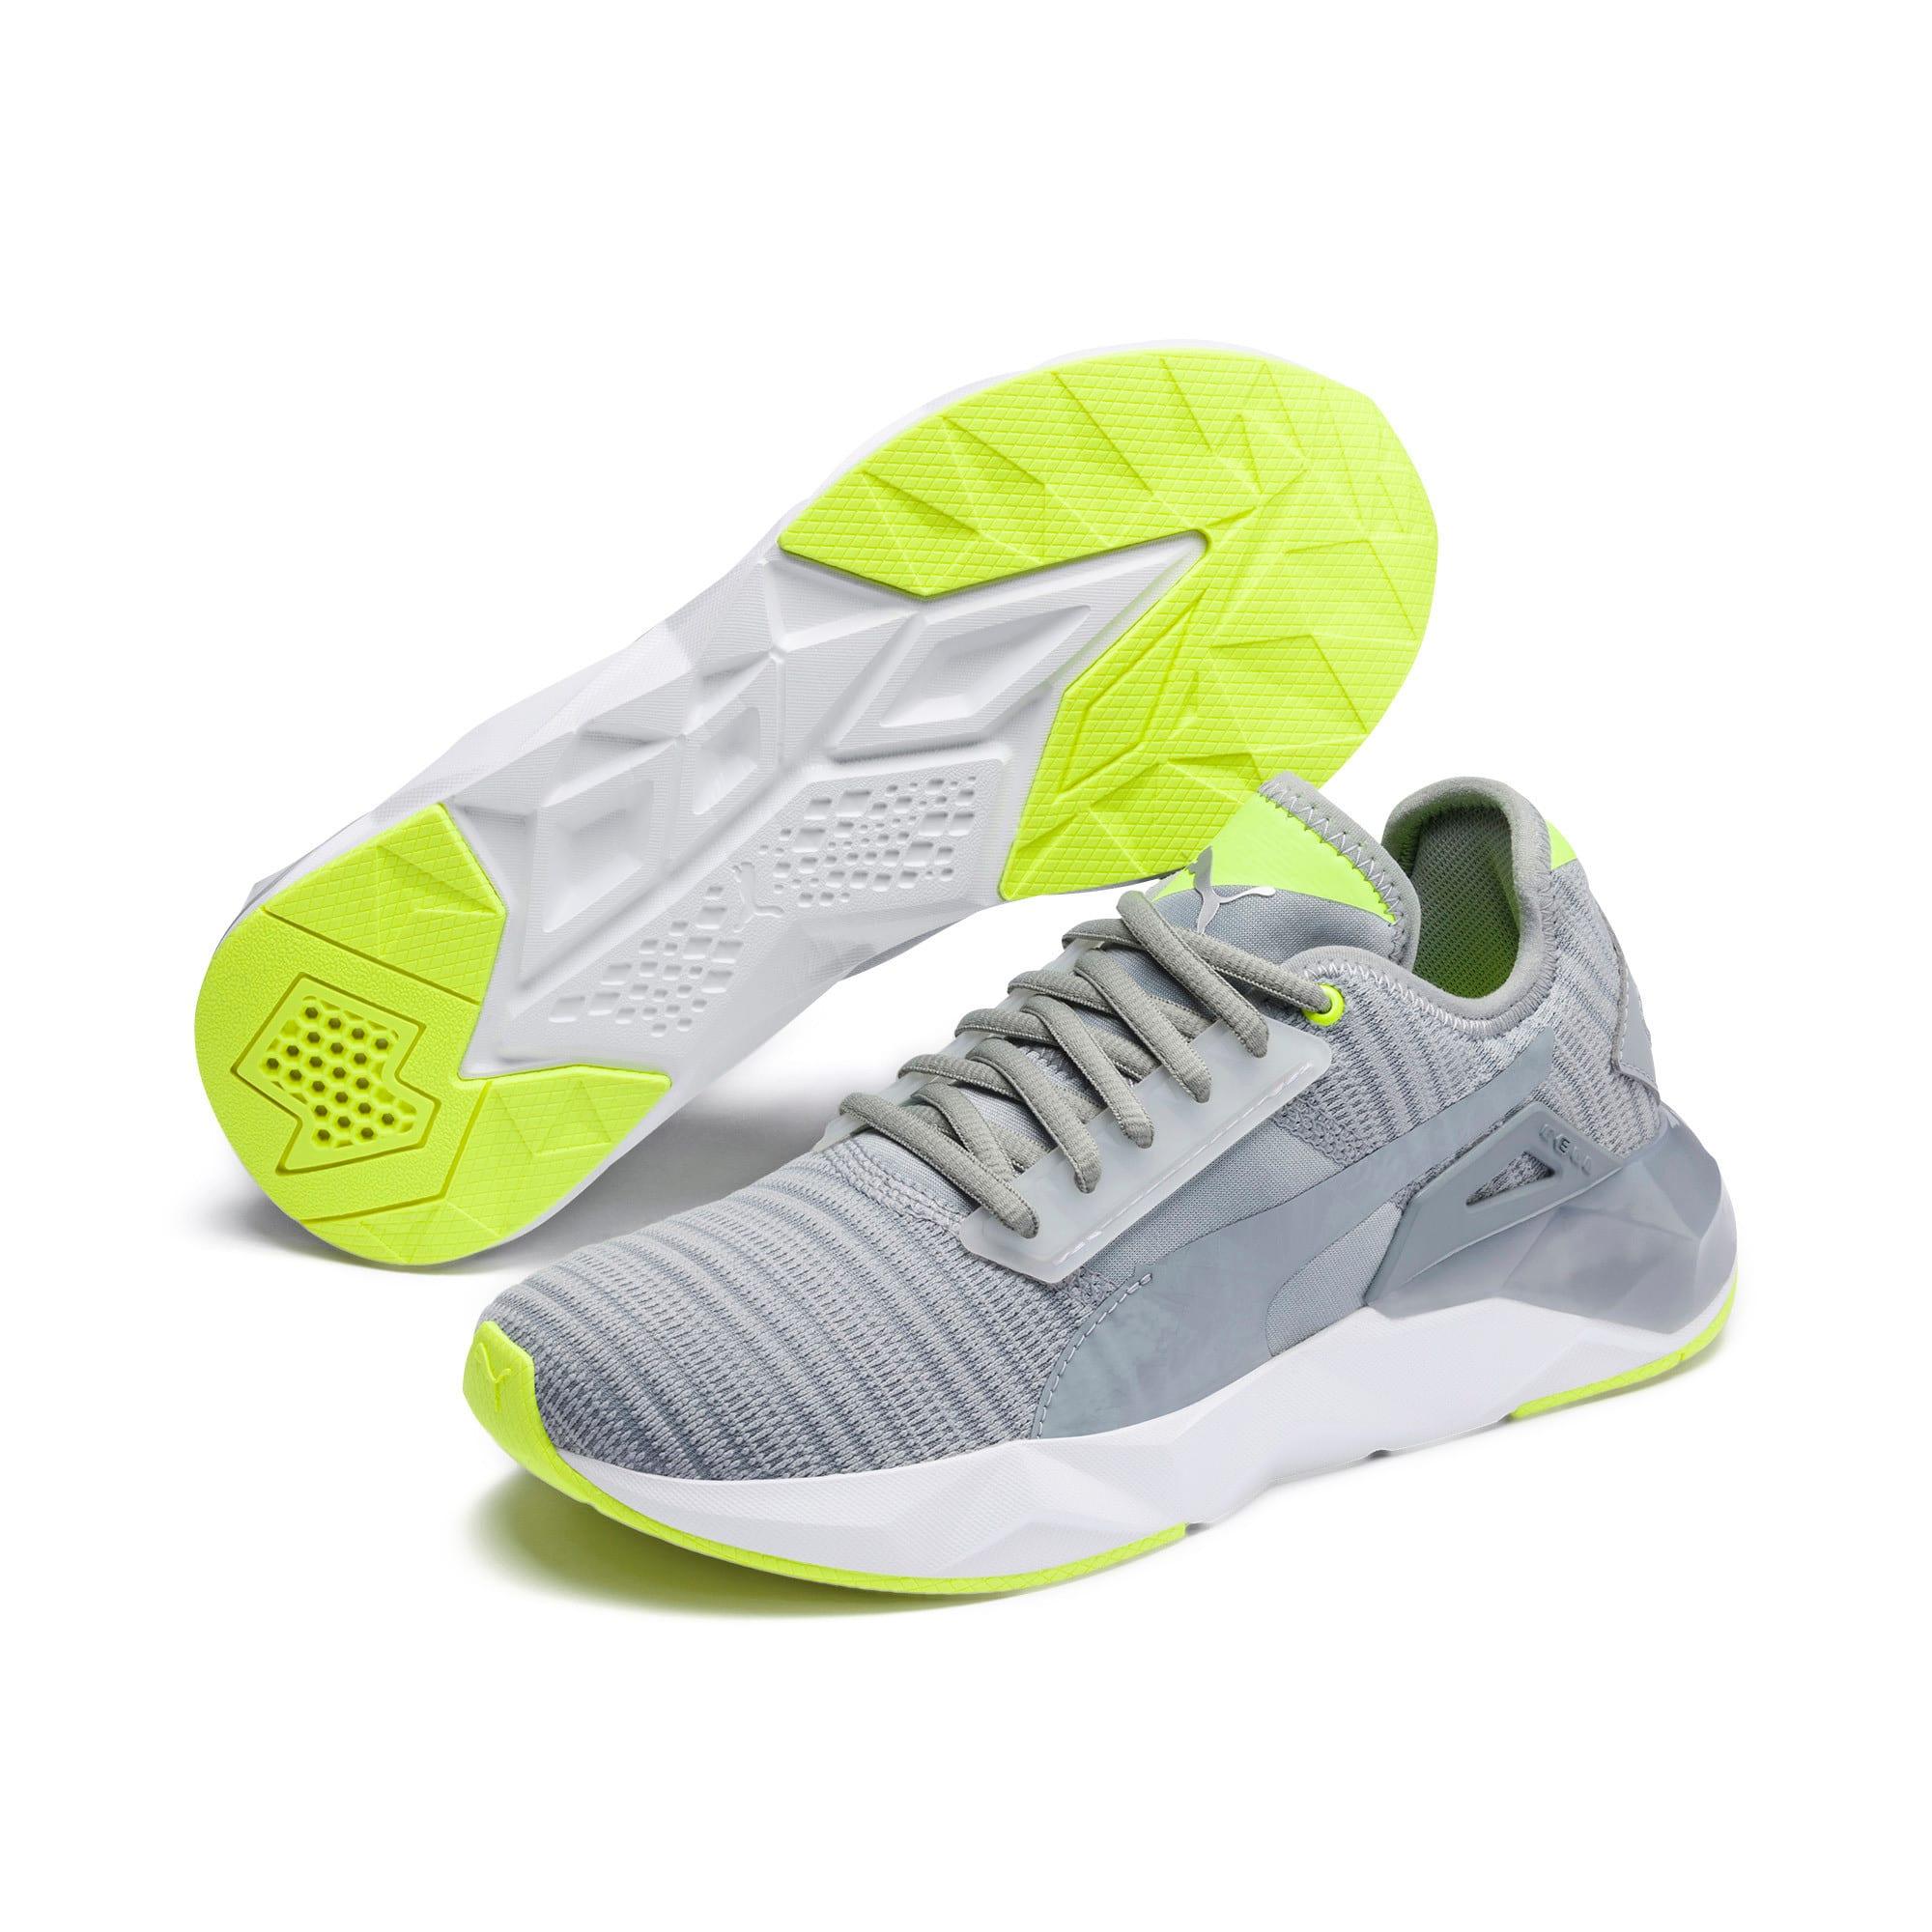 Thumbnail 3 of CELL Plasmic Damen Sneaker, Quarry-Puma White, medium